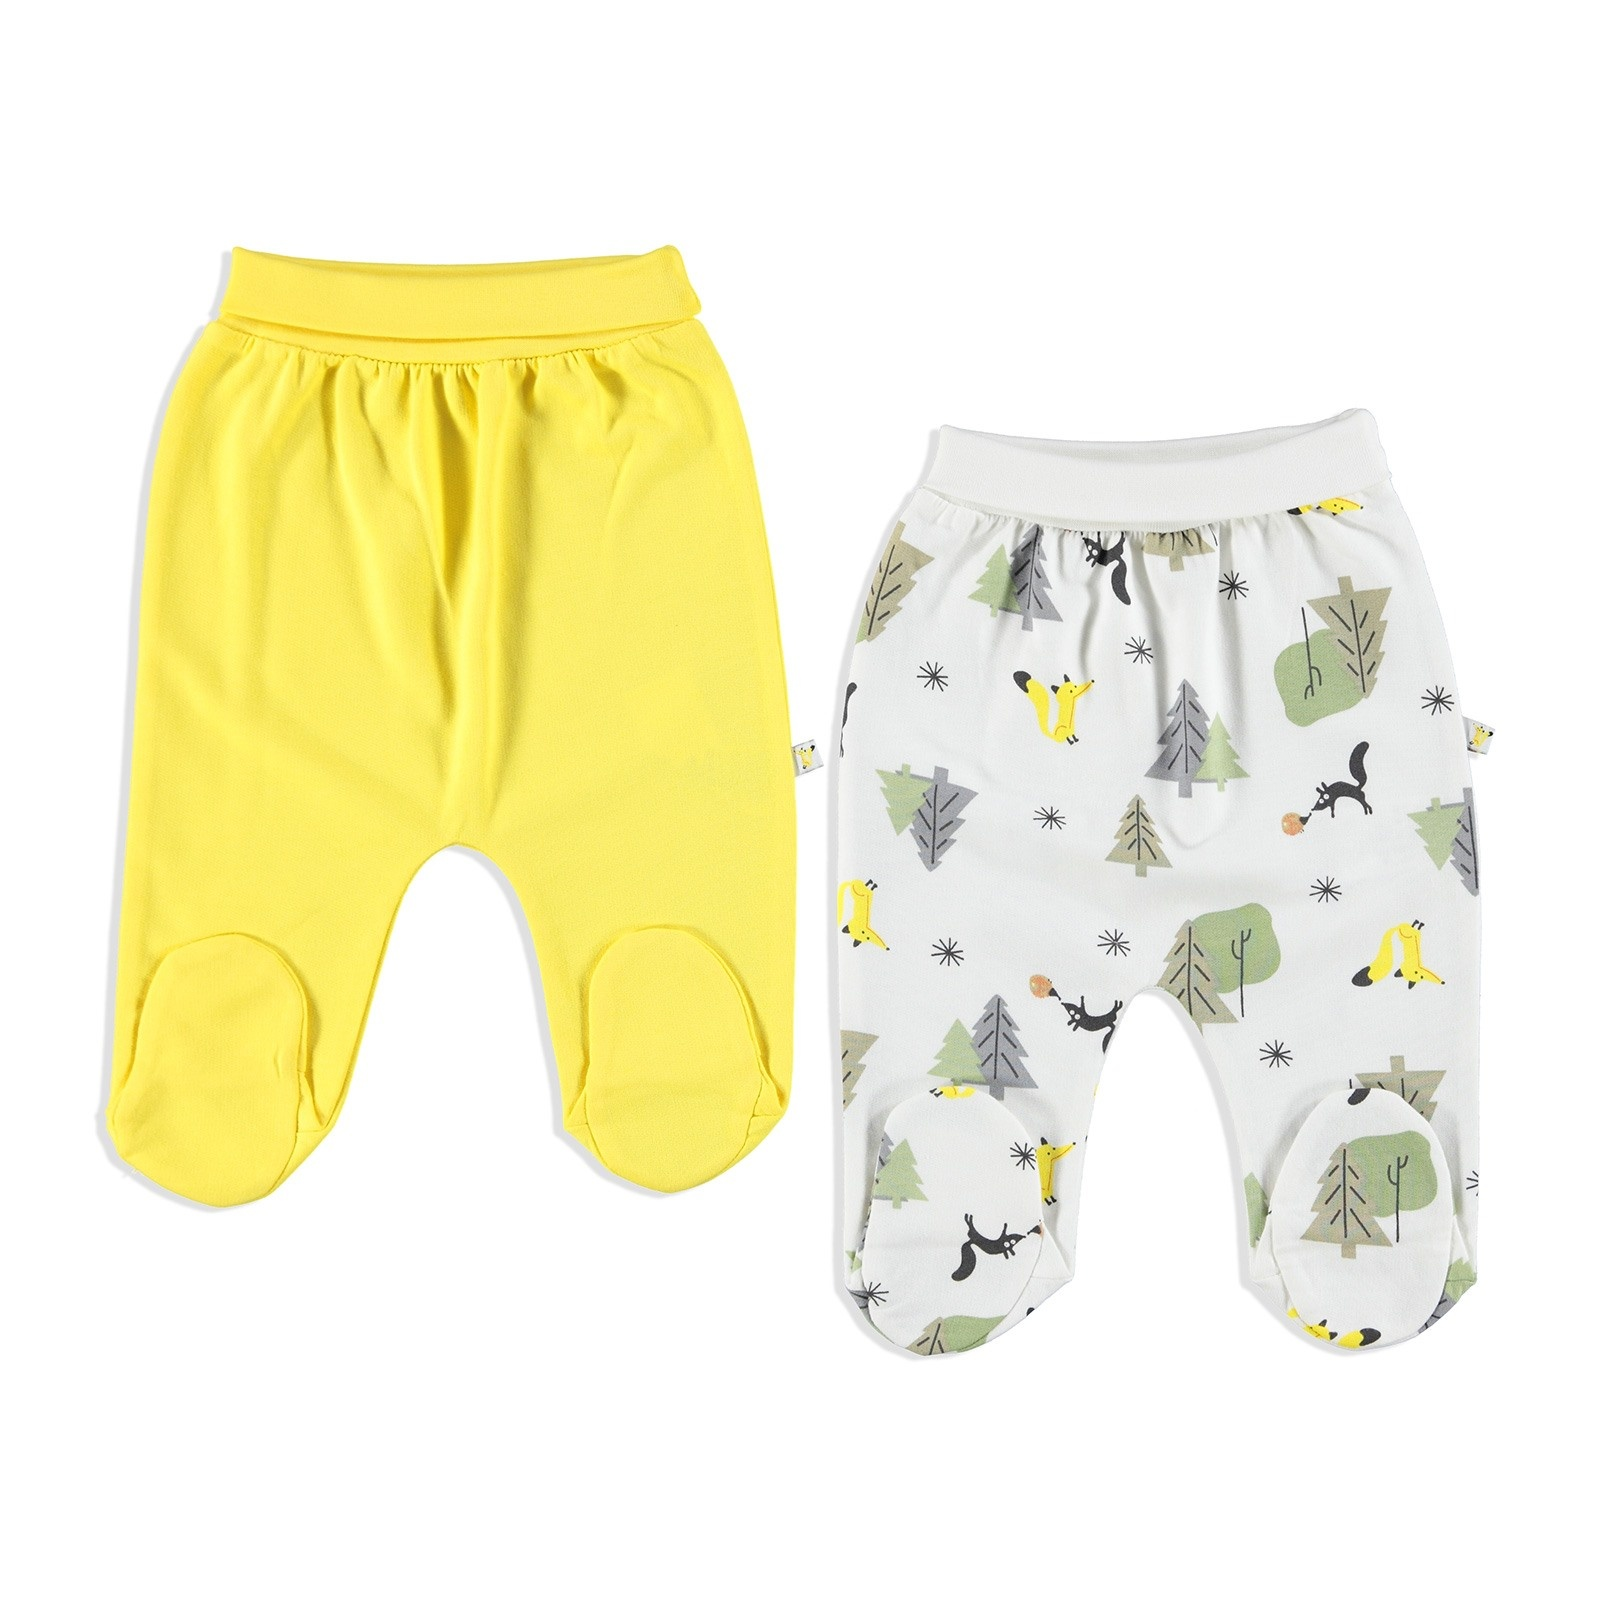 Ebebek Carmin Baby Little Fox Interlock Footed Pants 2 Pcs